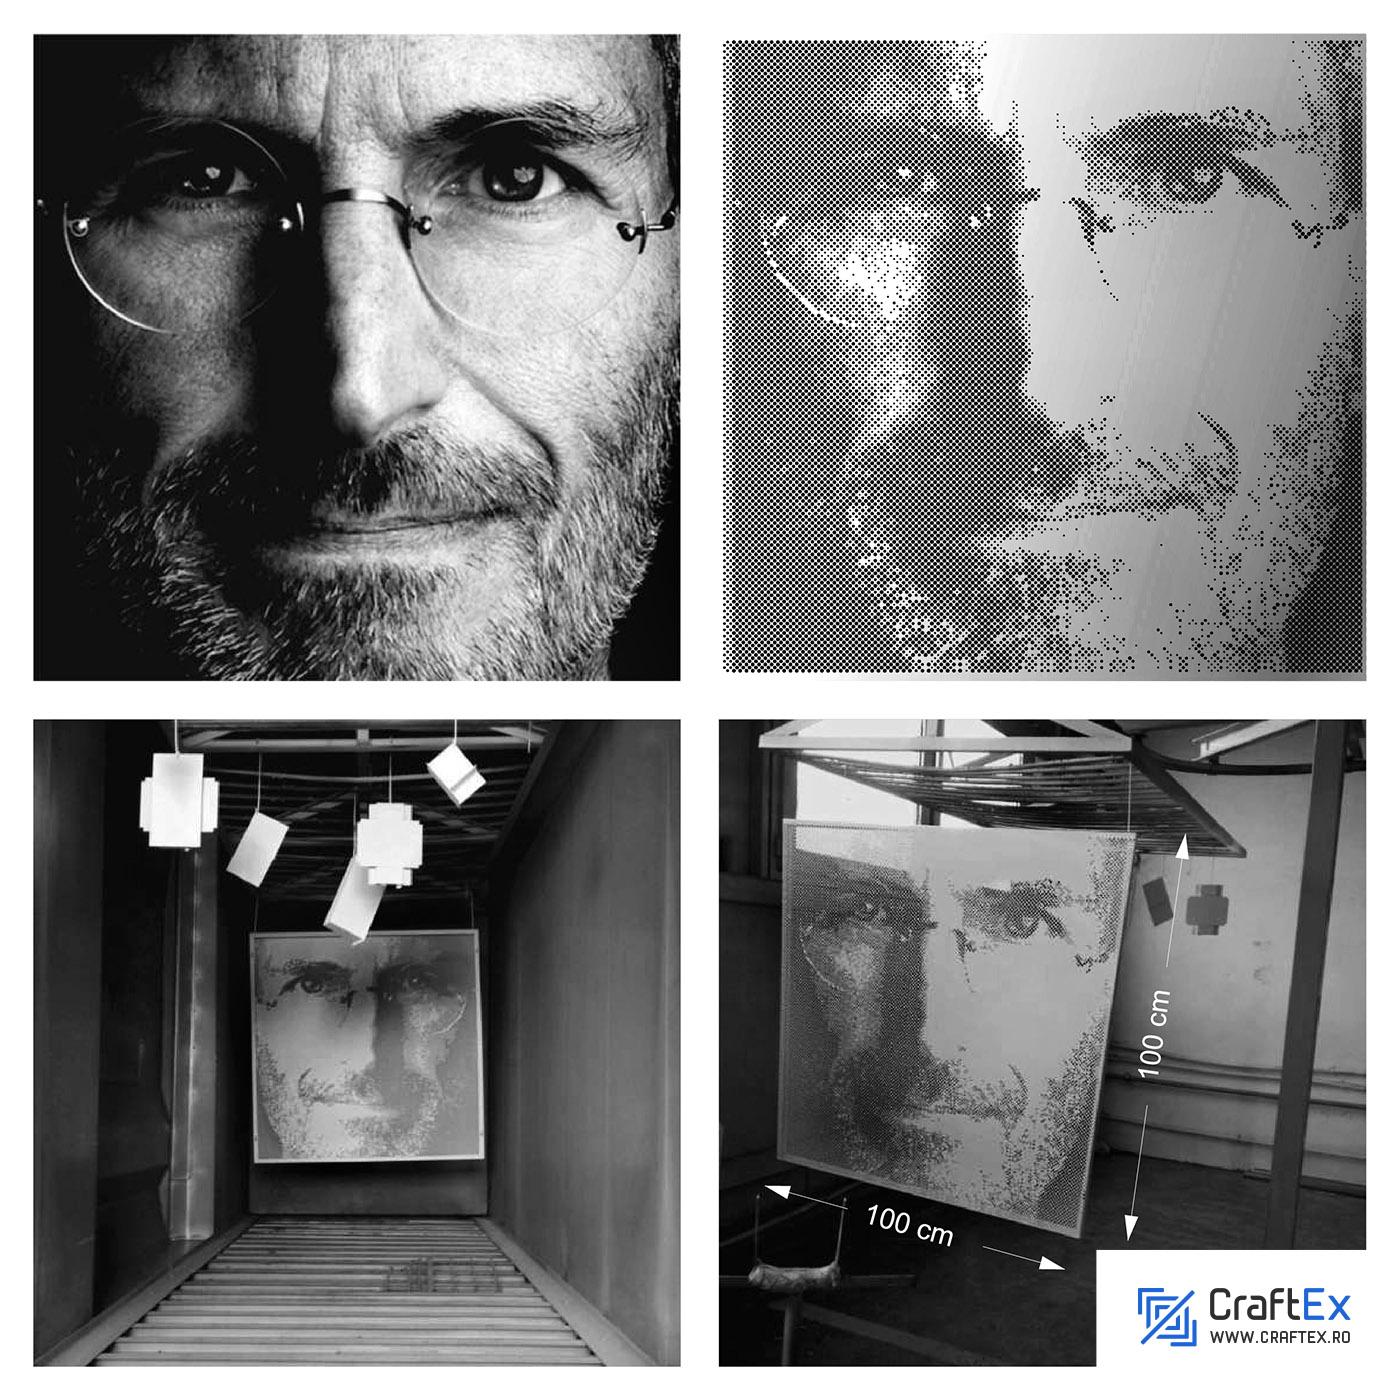 www.craftex.ro - Portrete - Steve Jobs